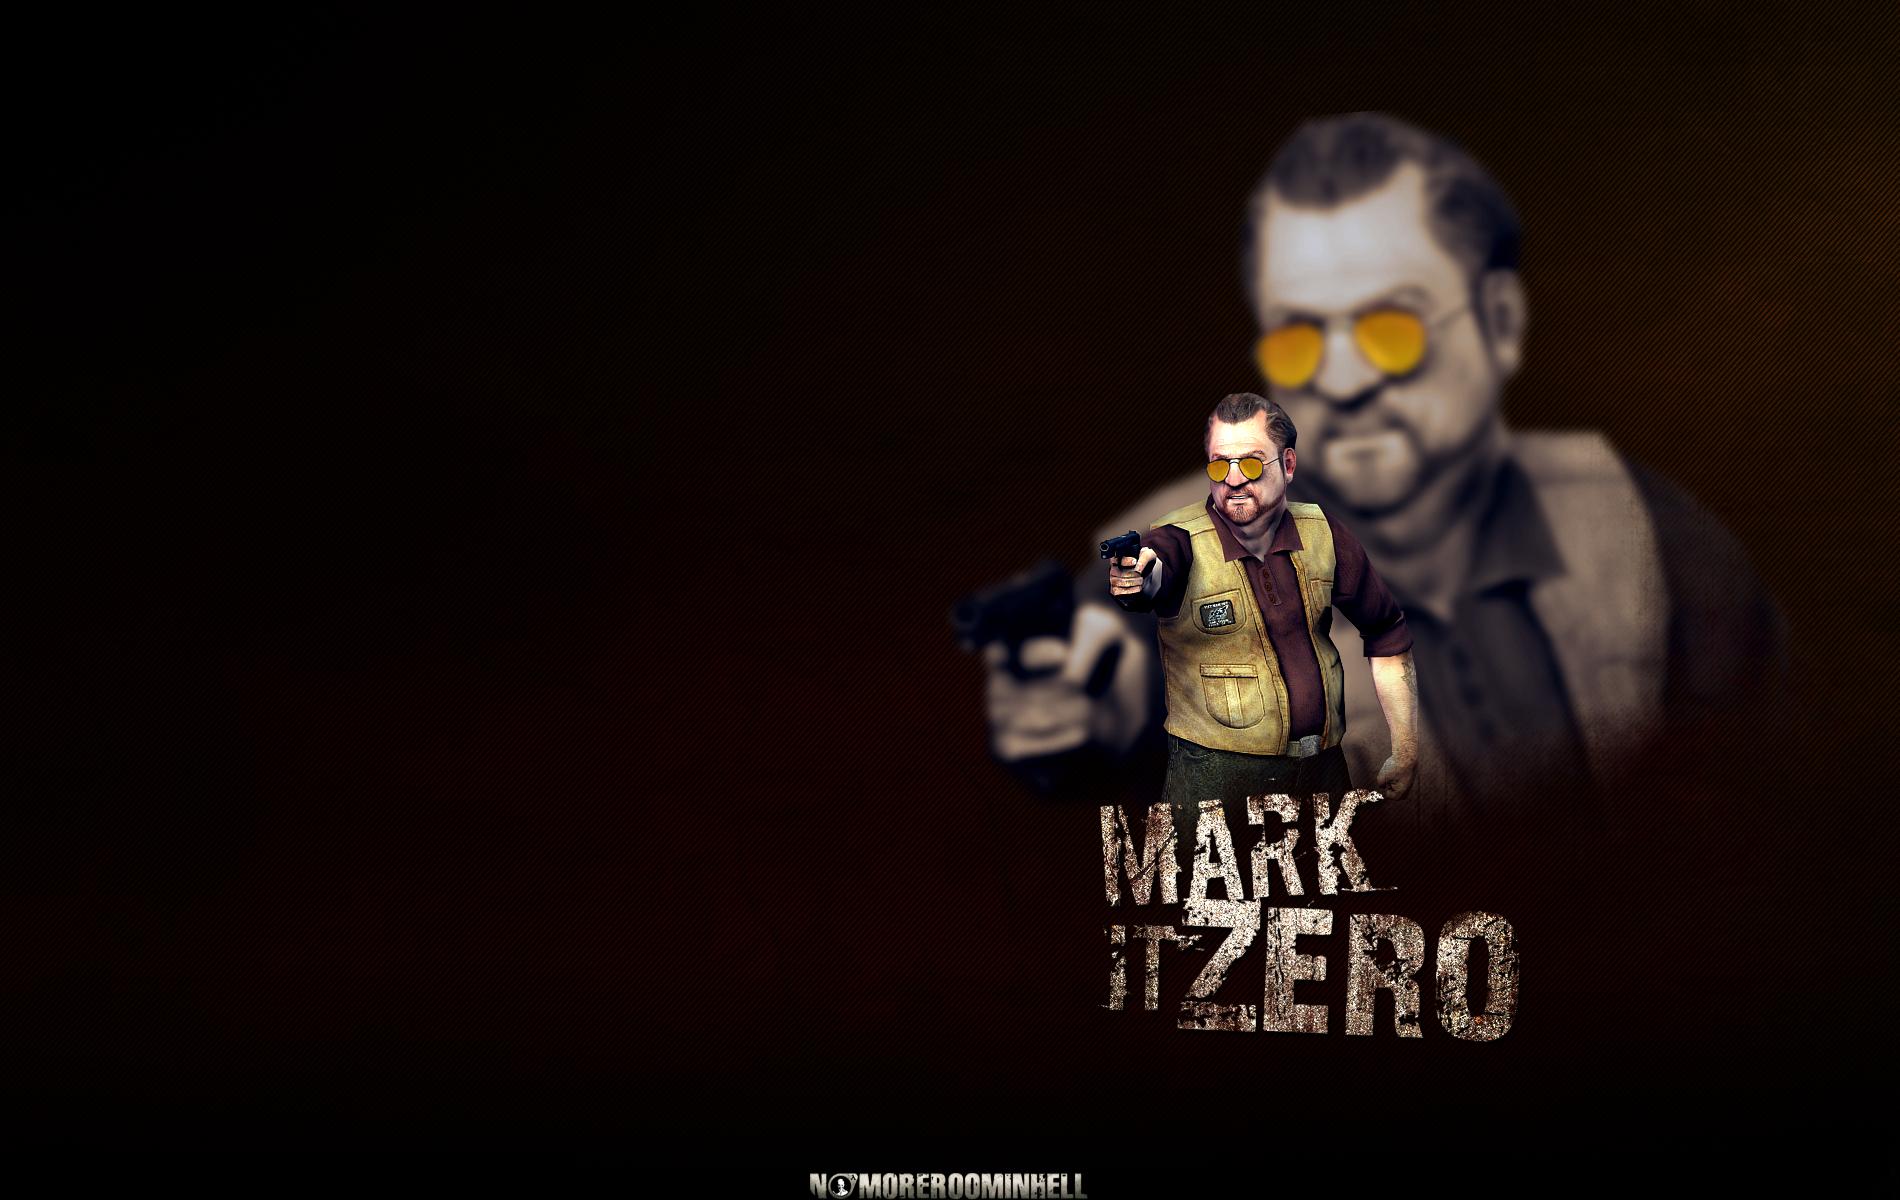 Mark It Zero Wallpaper File No More Room In Hell Mod For Half